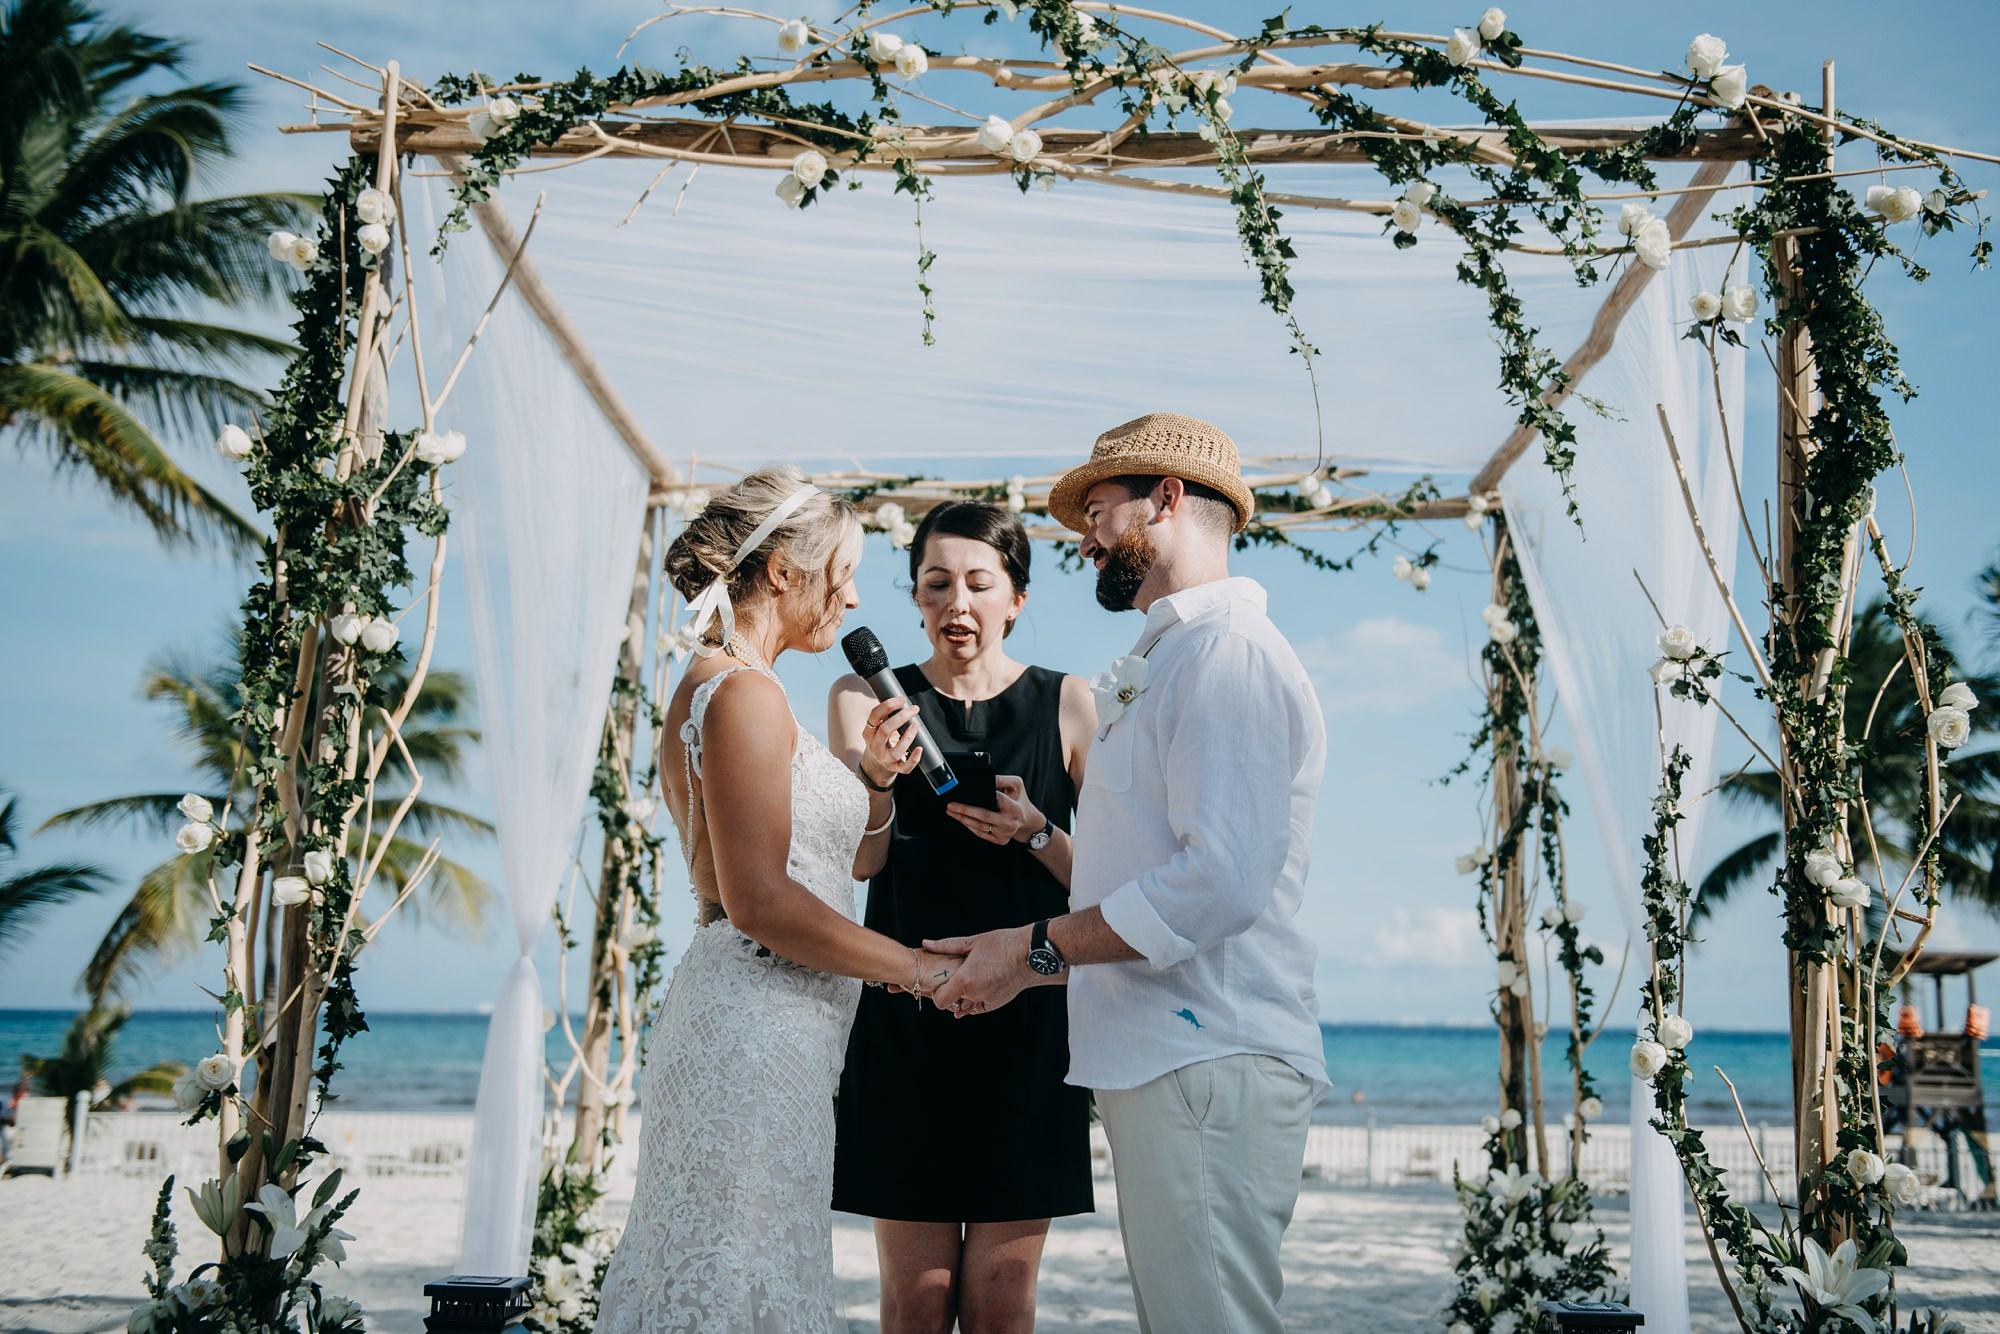 bride and groom vows beach ceremony at mexico hotel Riu Palace Riviera Maya